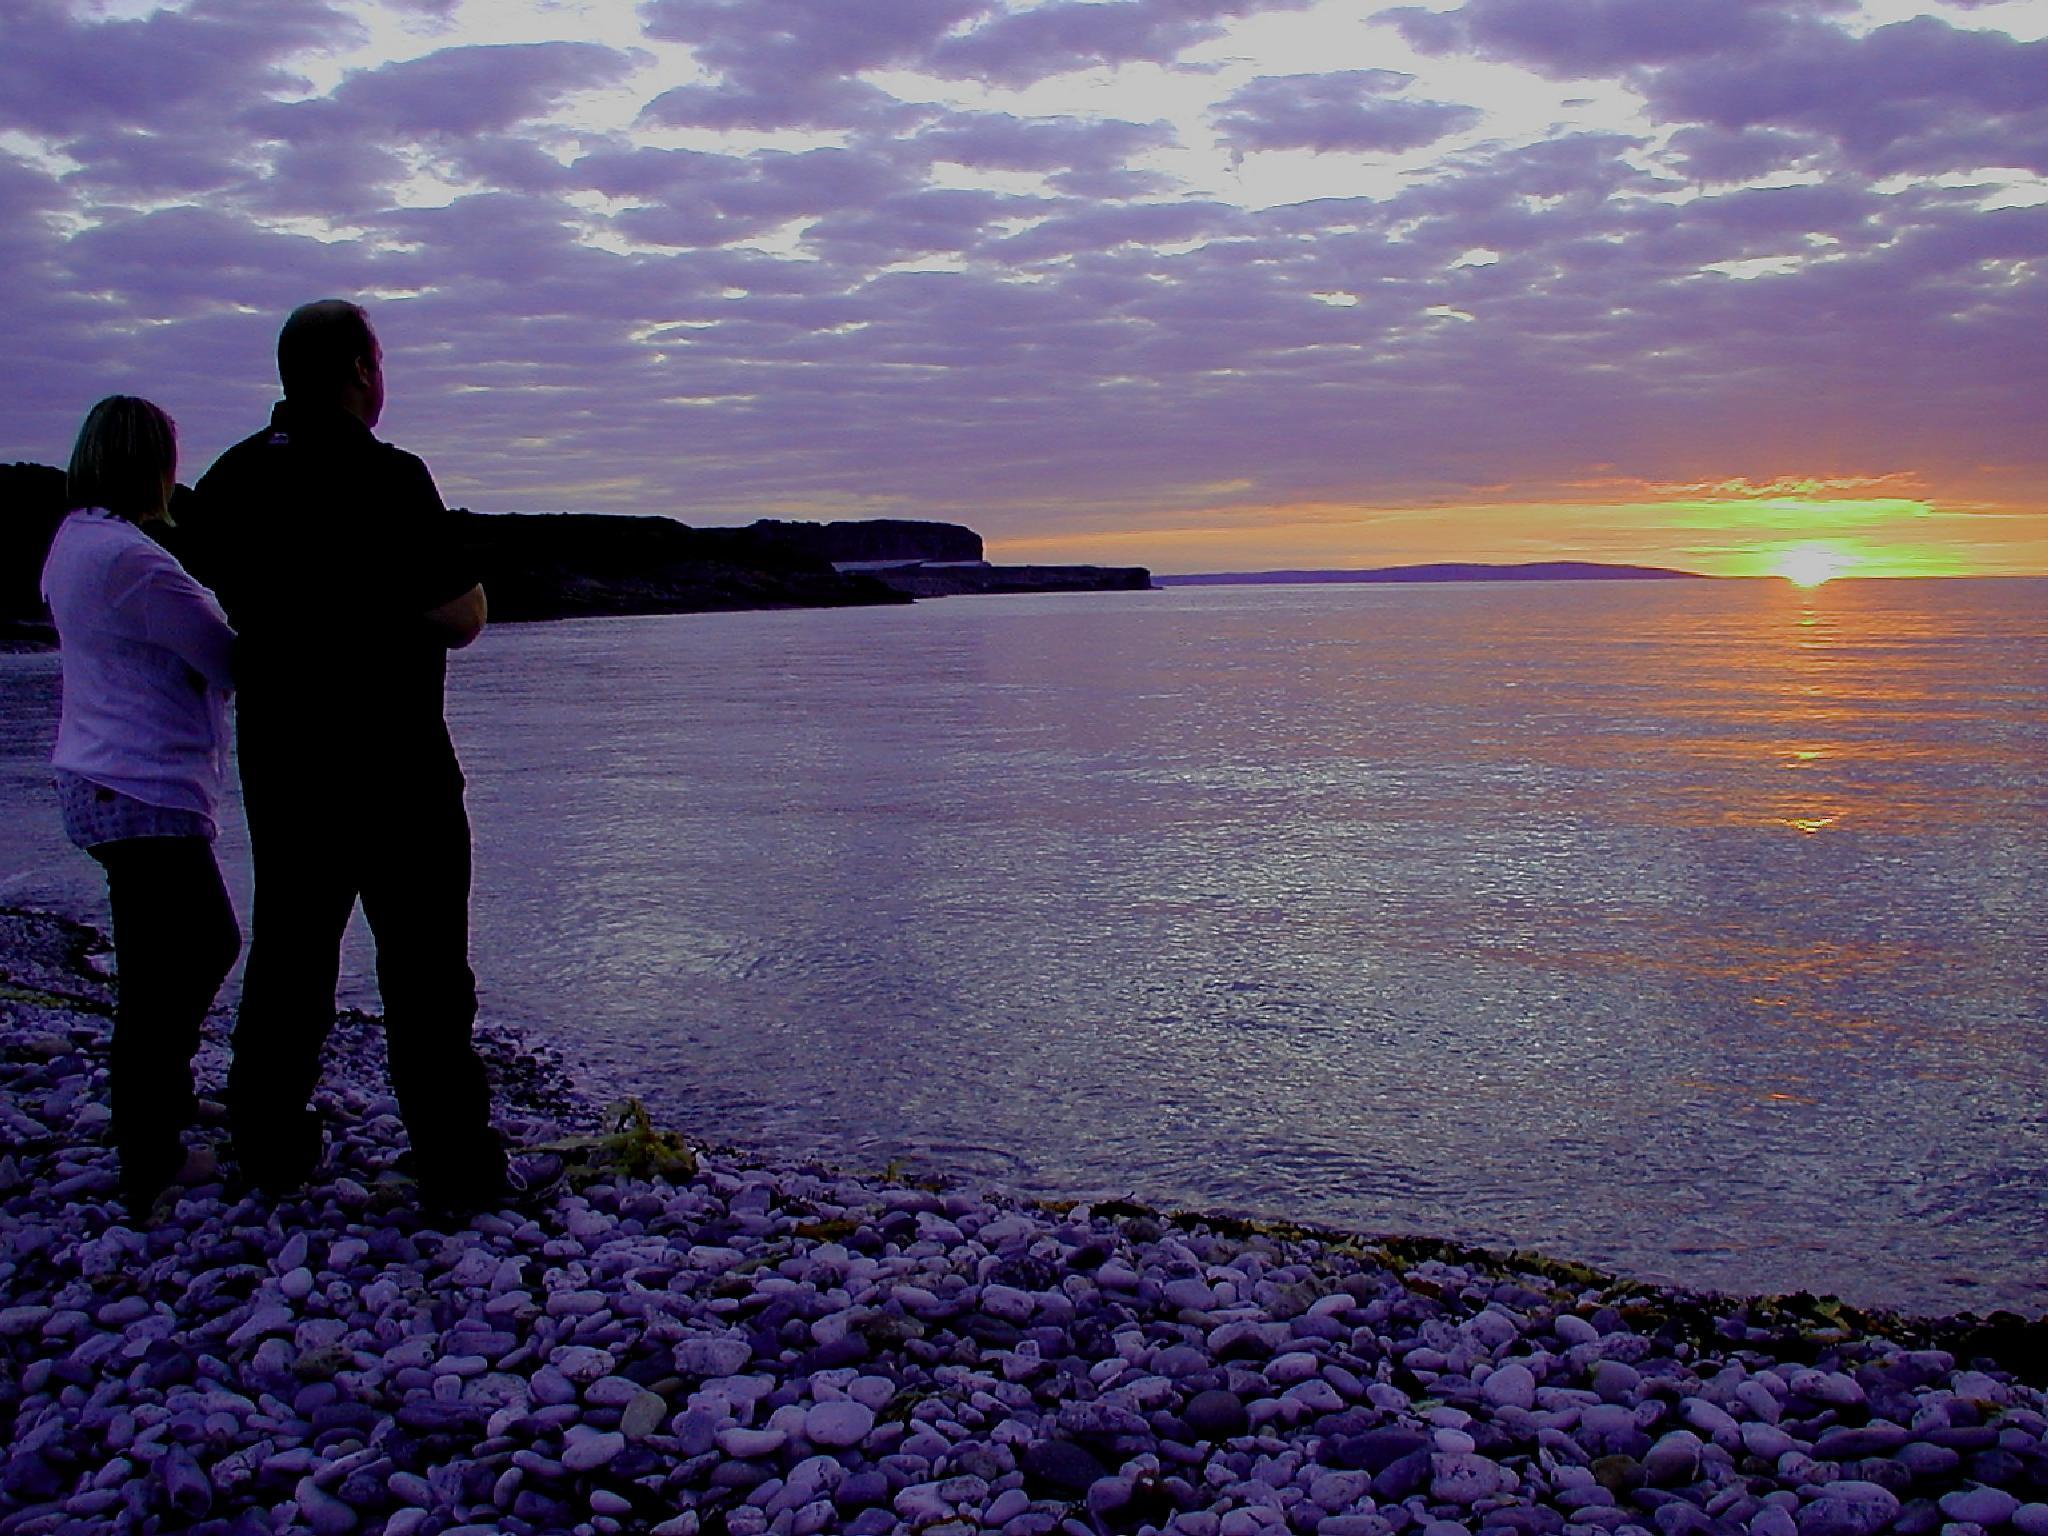 Penmon Sunset by Mark Ratcliffe